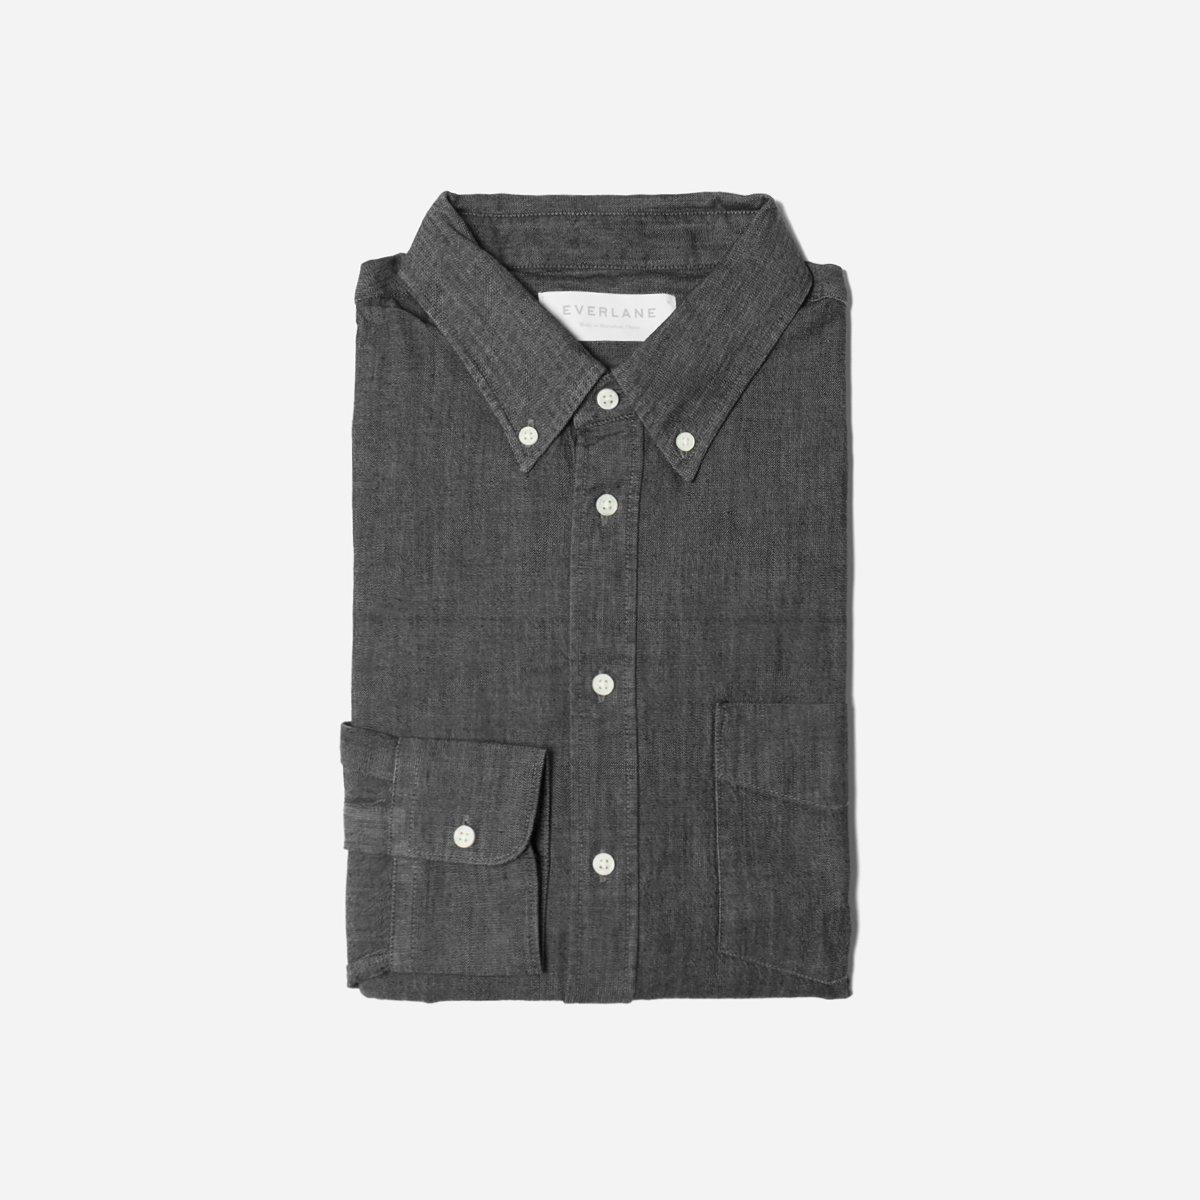 Everlane Denim Long-Sleeve Shirt, Dark Gray Denim